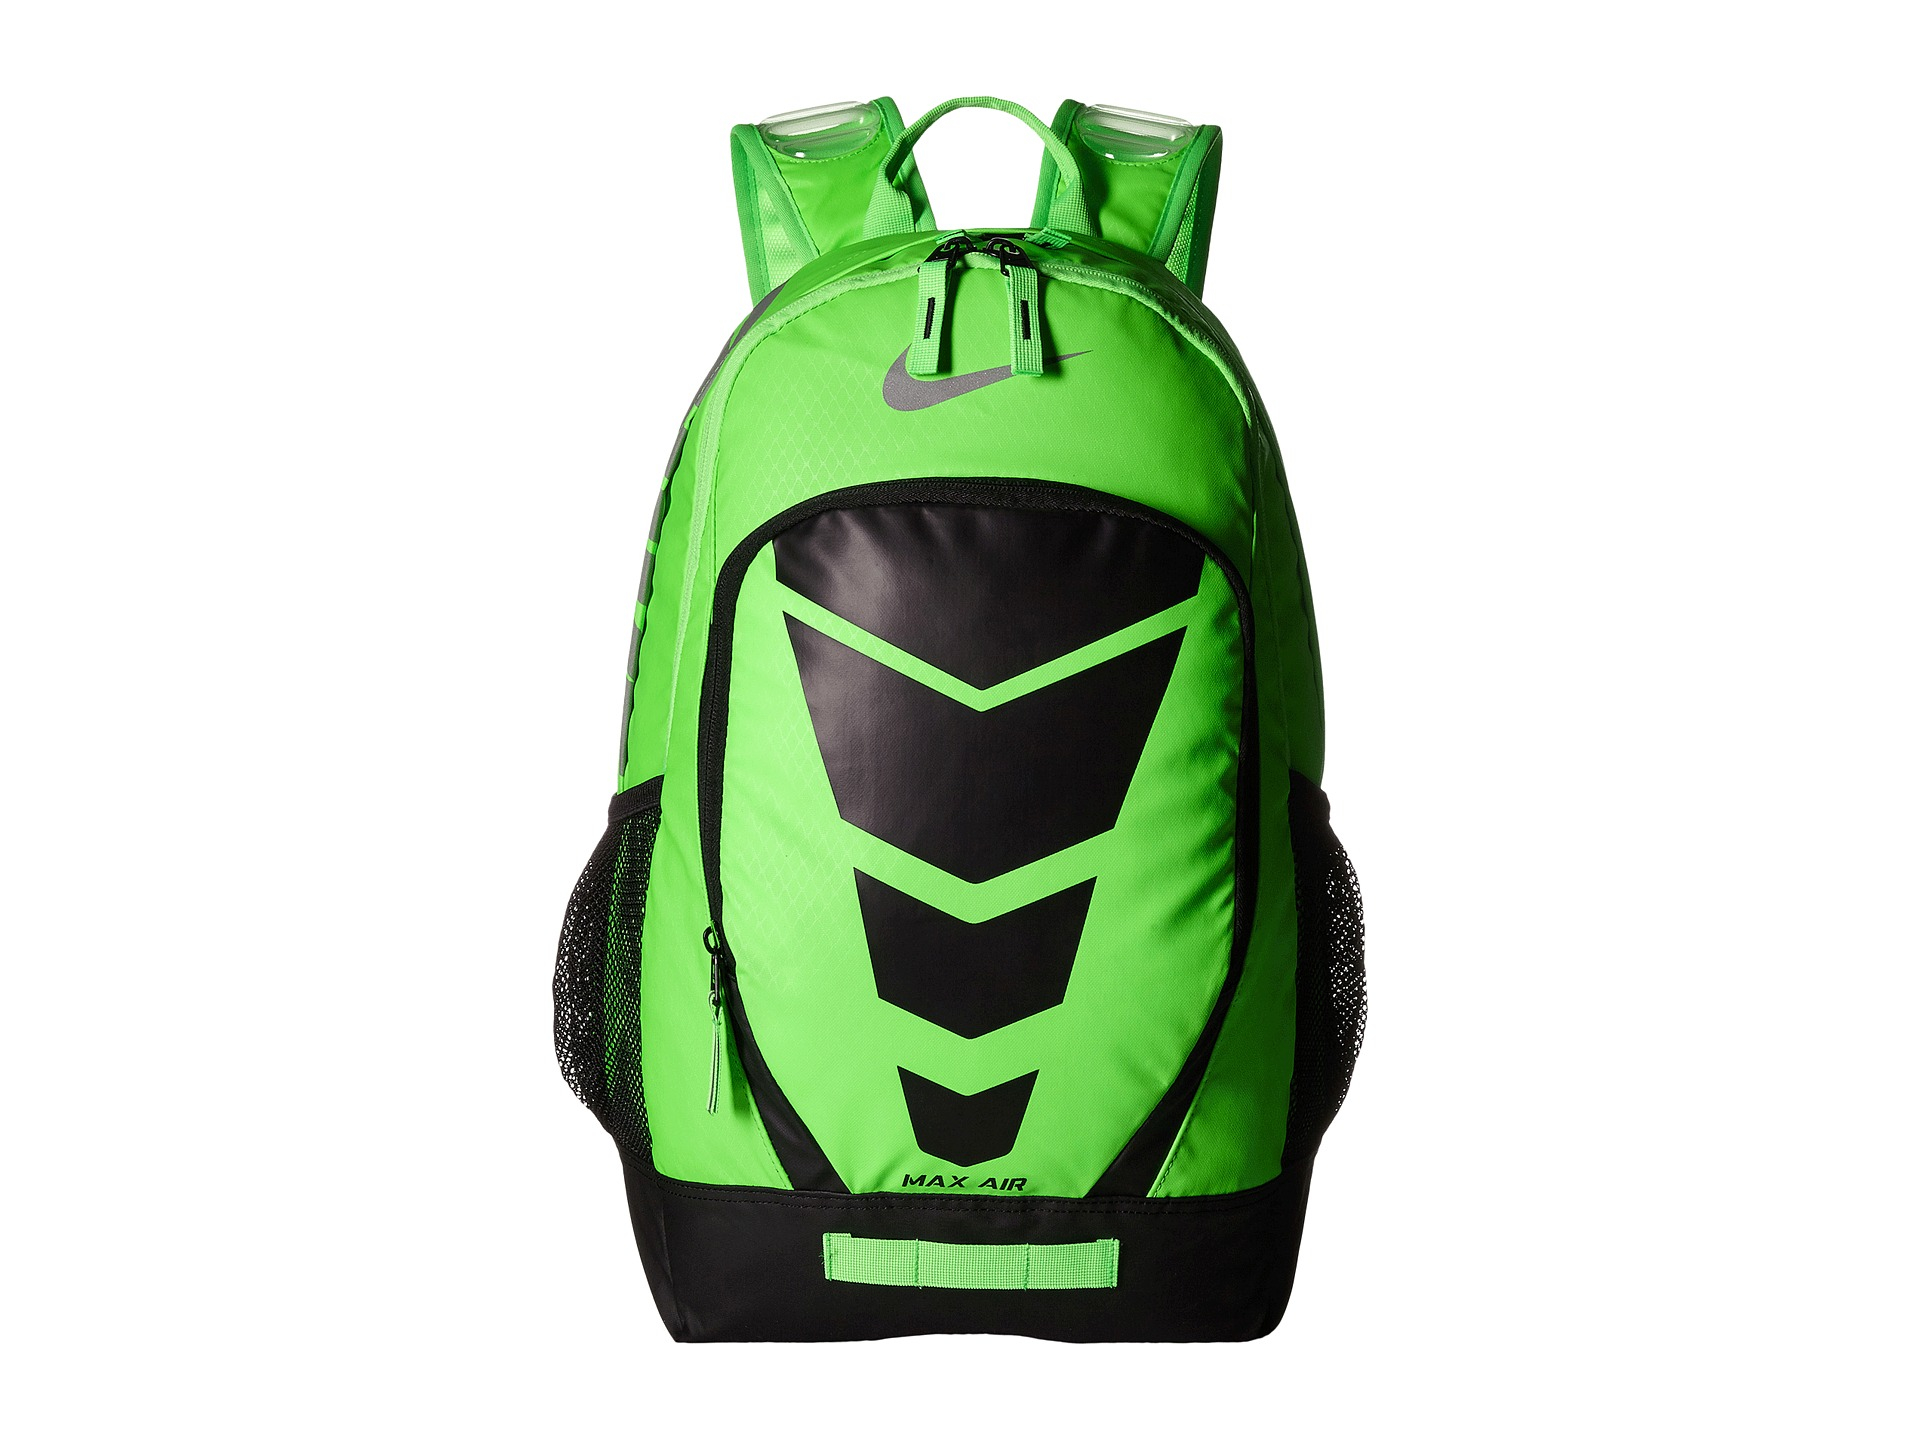 Lyst - Nike Max Air Vapor Backpack in Green 23b5550892